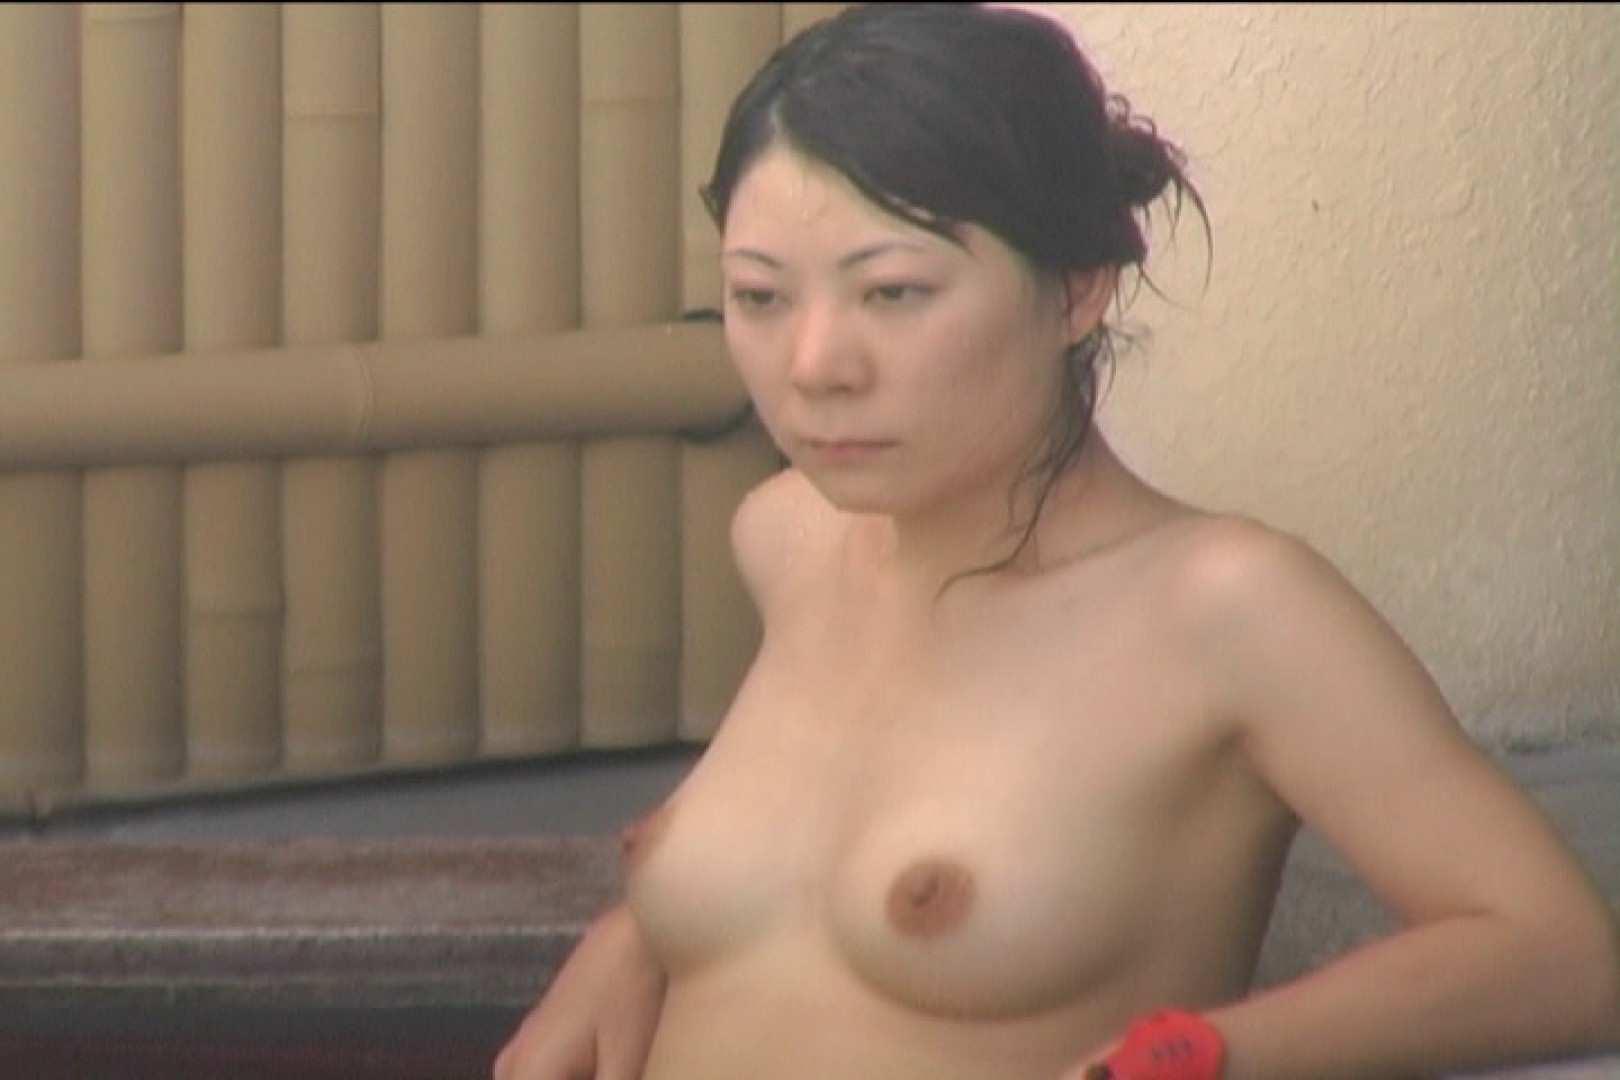 Aquaな露天風呂Vol.533 盗撮映像  34Pix 6